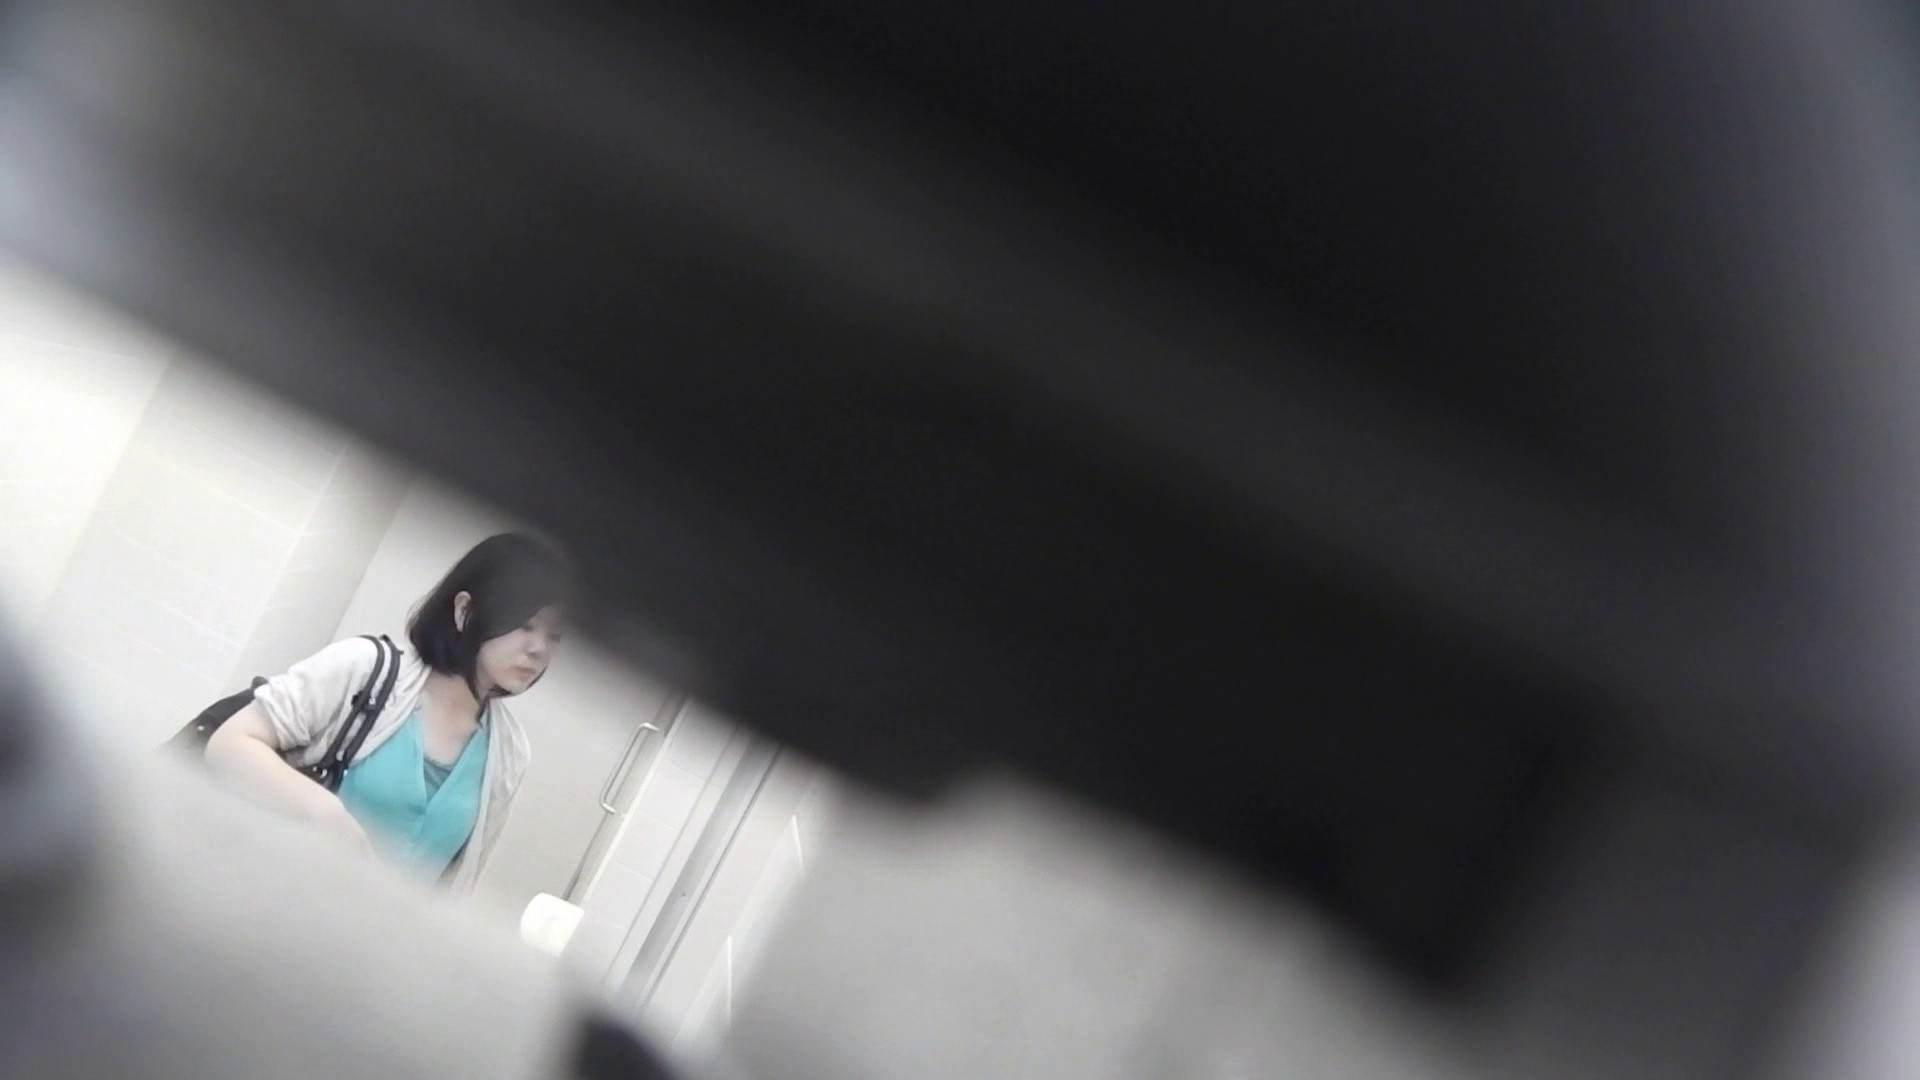 vol.39 命がけ潜伏洗面所! ヲケツ プライベート 盗撮アダルト動画キャプチャ 102pic 68